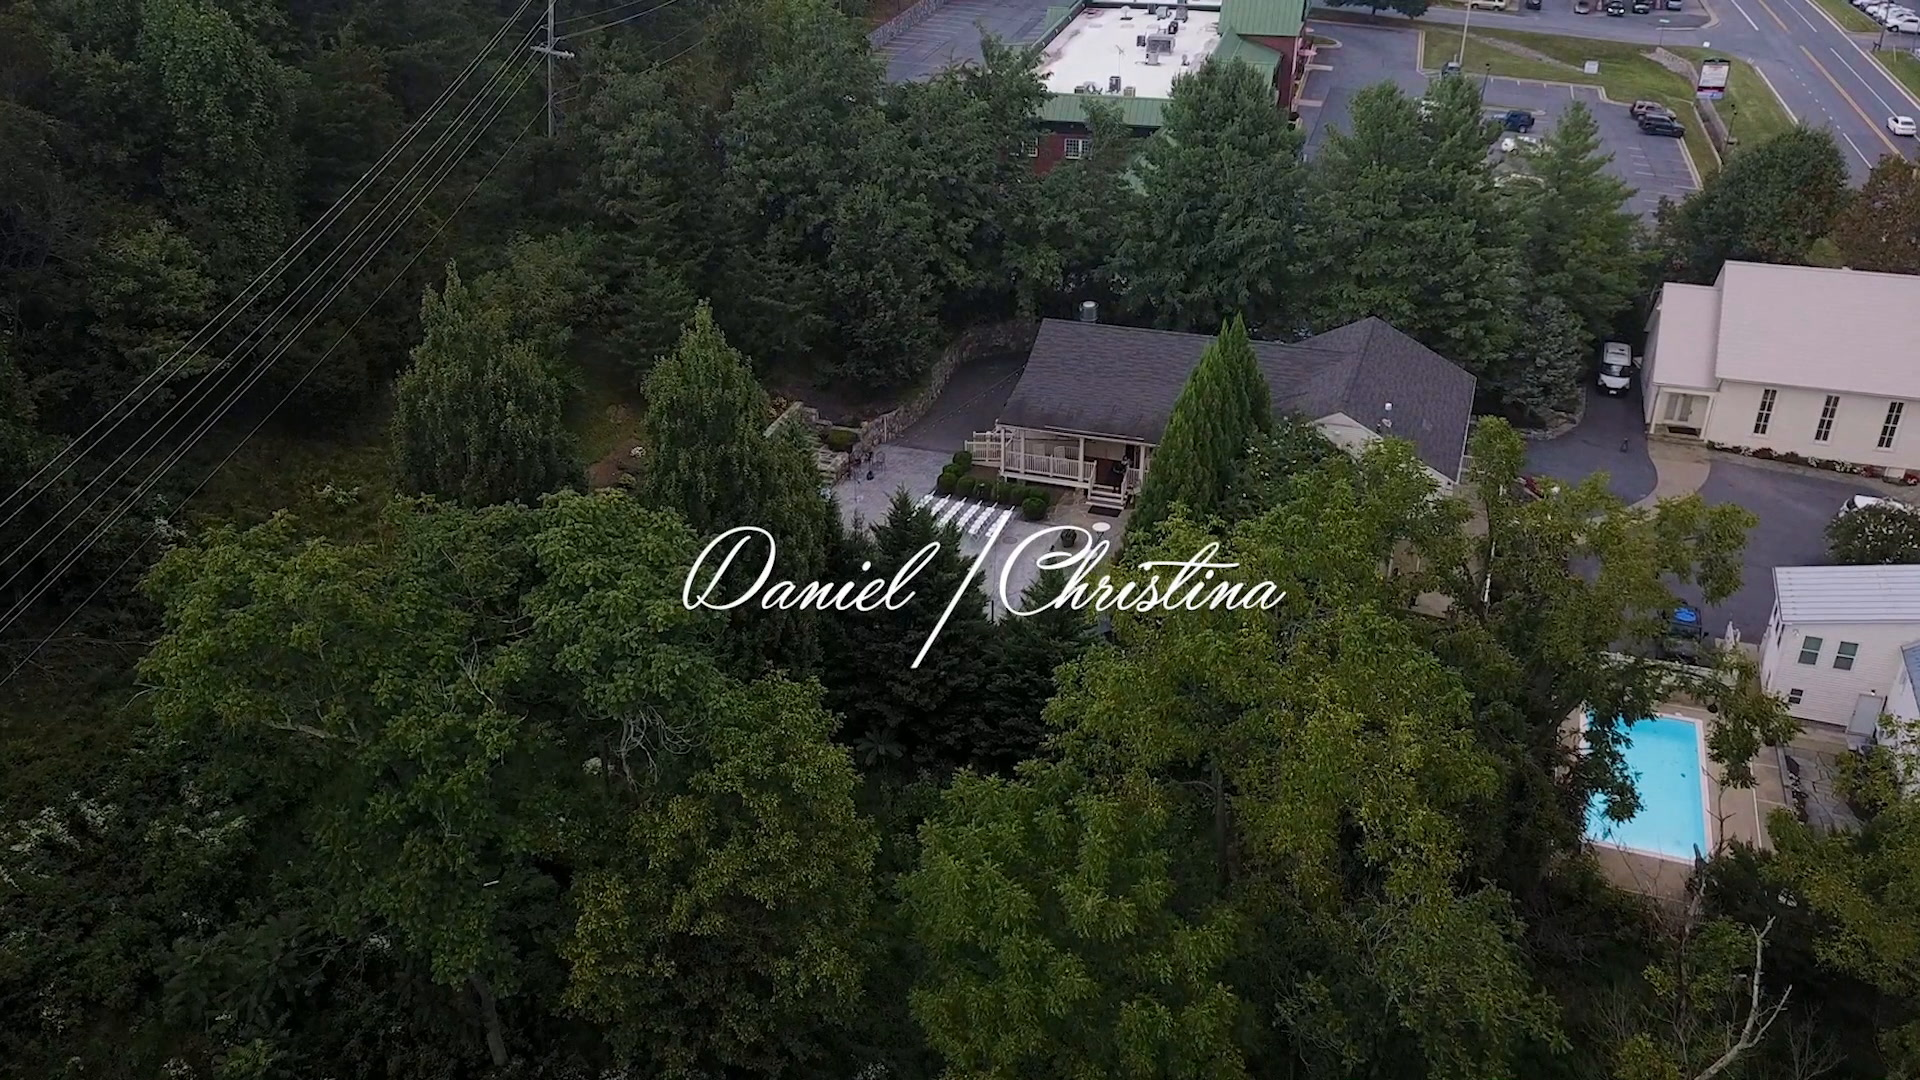 Daniel + Christina | Frederick, Maryland | Milton Ridge 26130 Frederick Rd